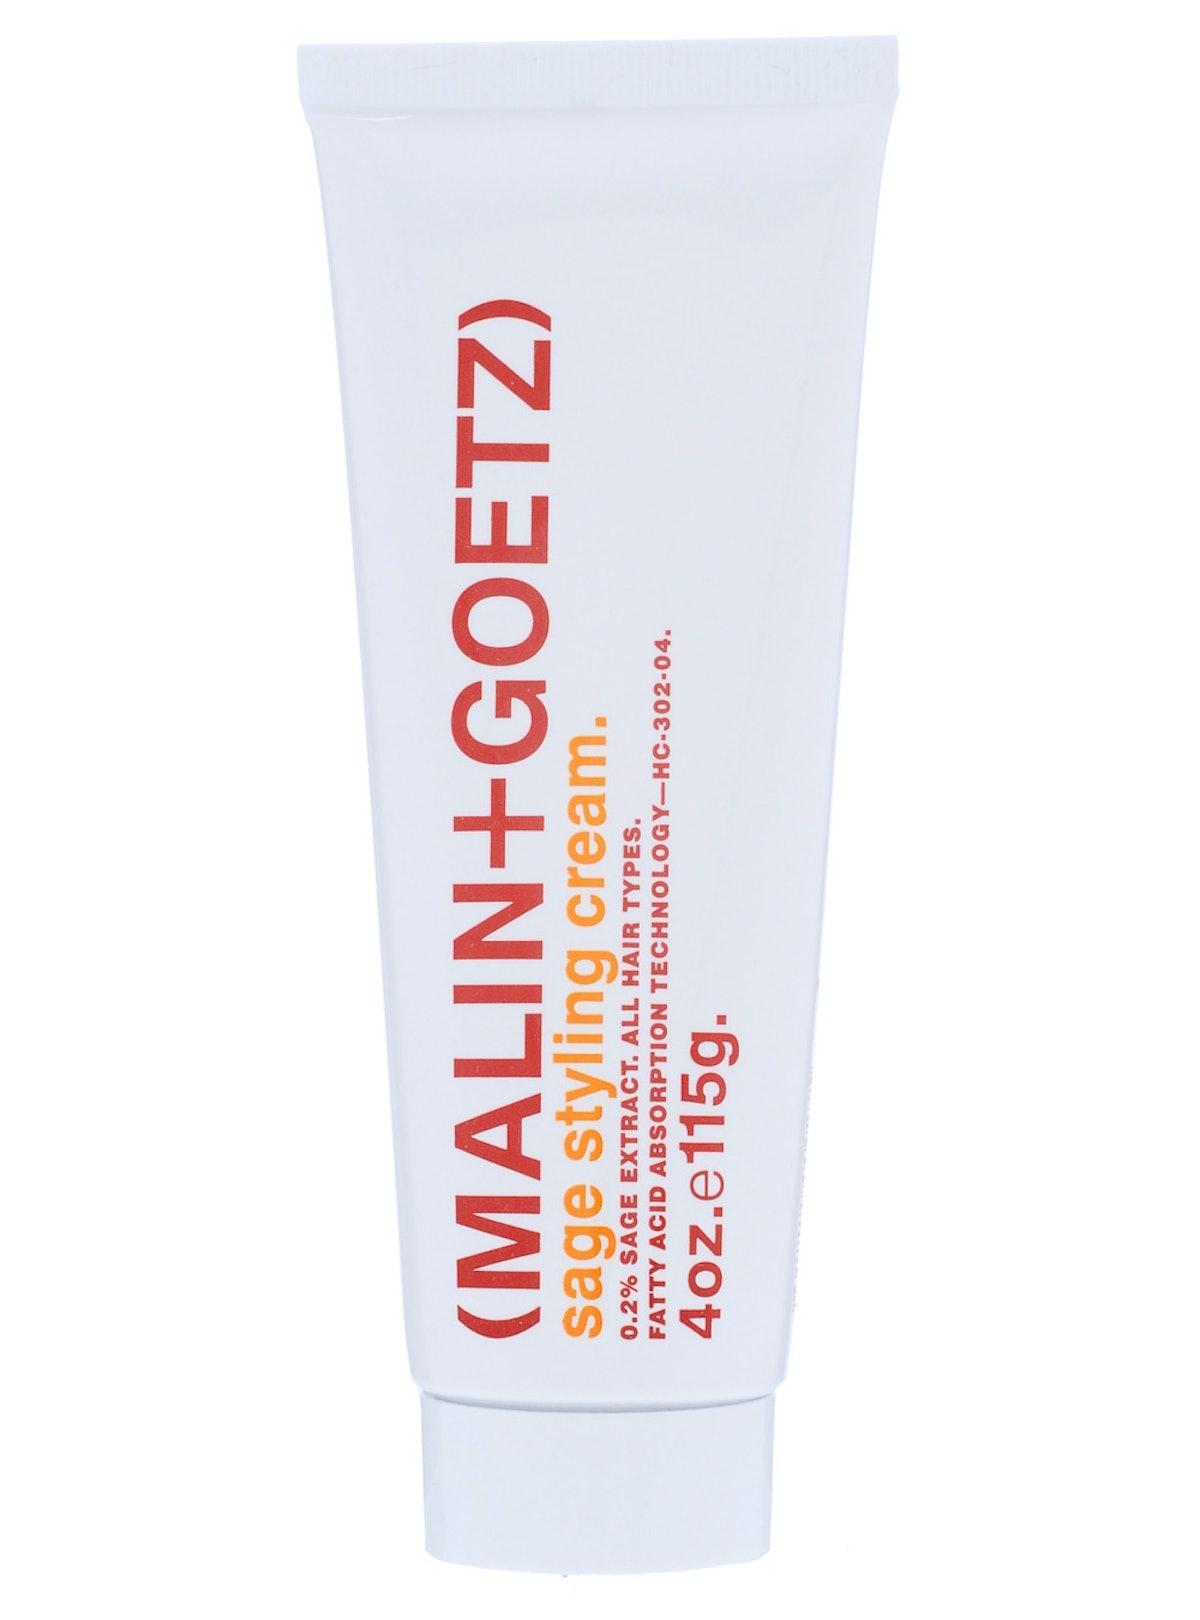 Malin-sage-styling-cream_4oz